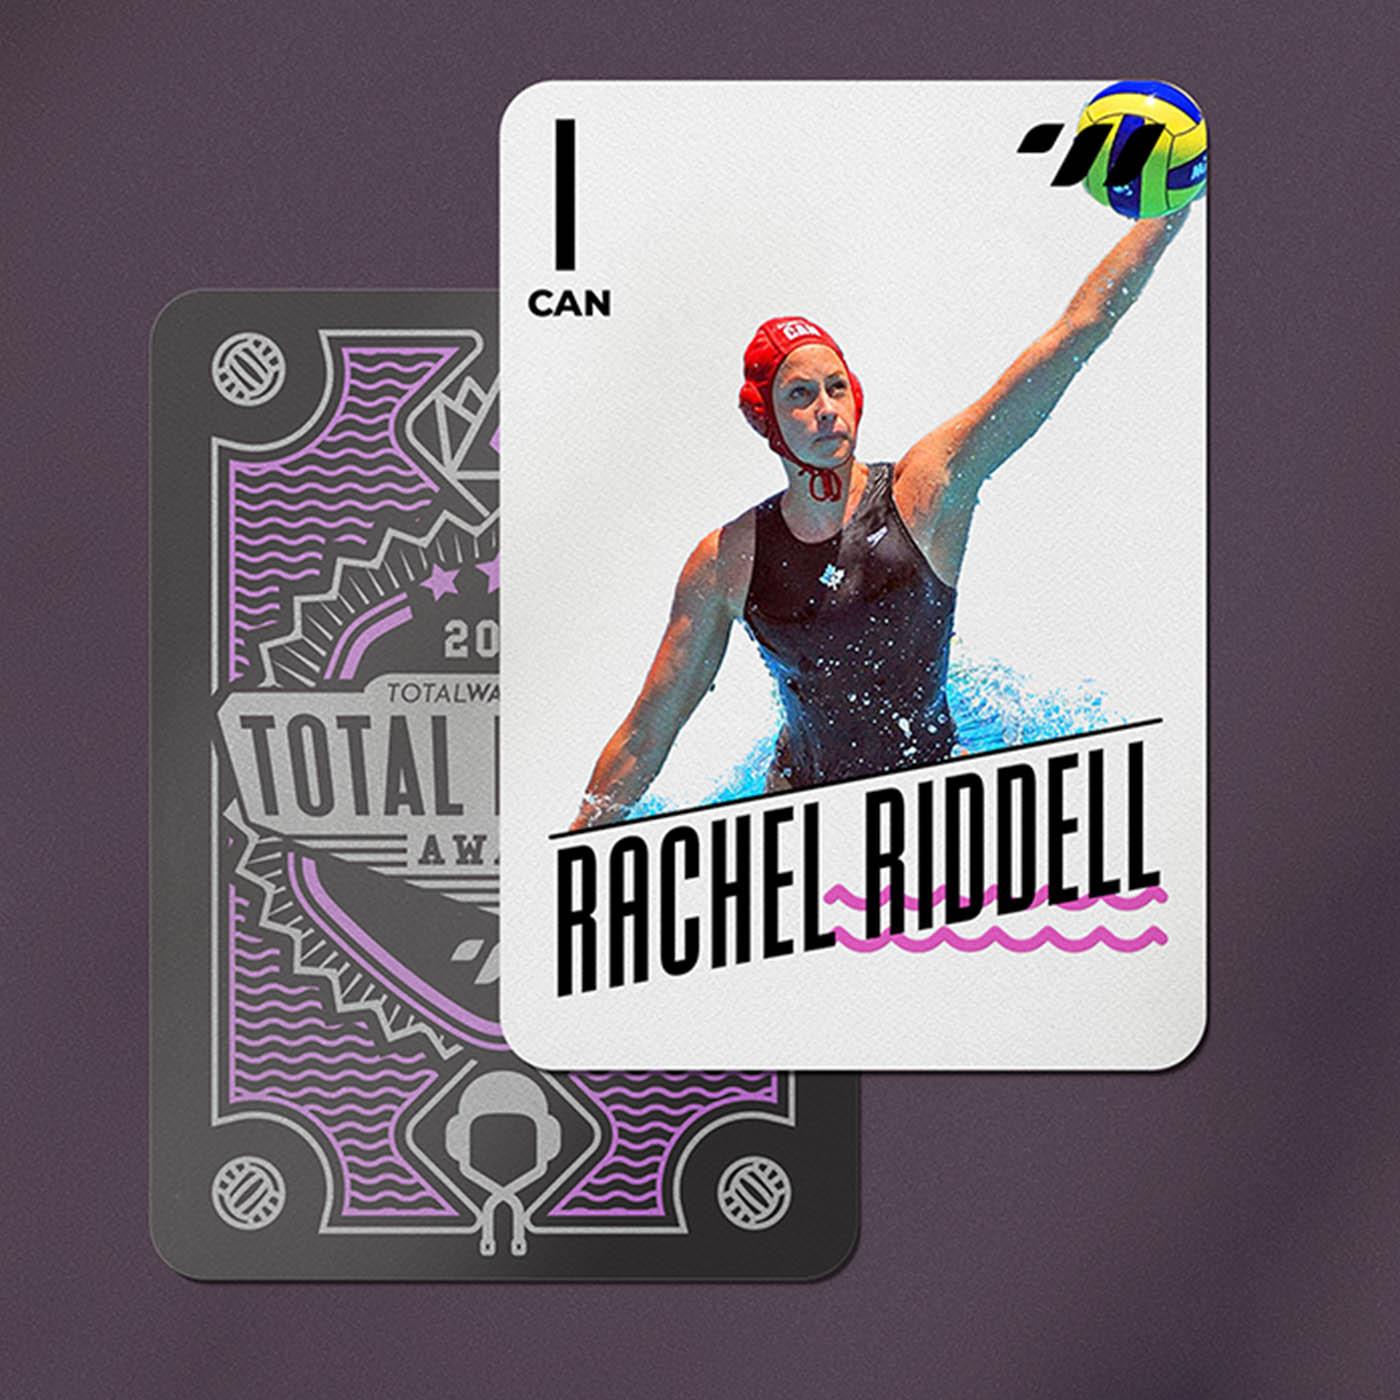 GOALKEEPER - Rachel Riddel (CAN)